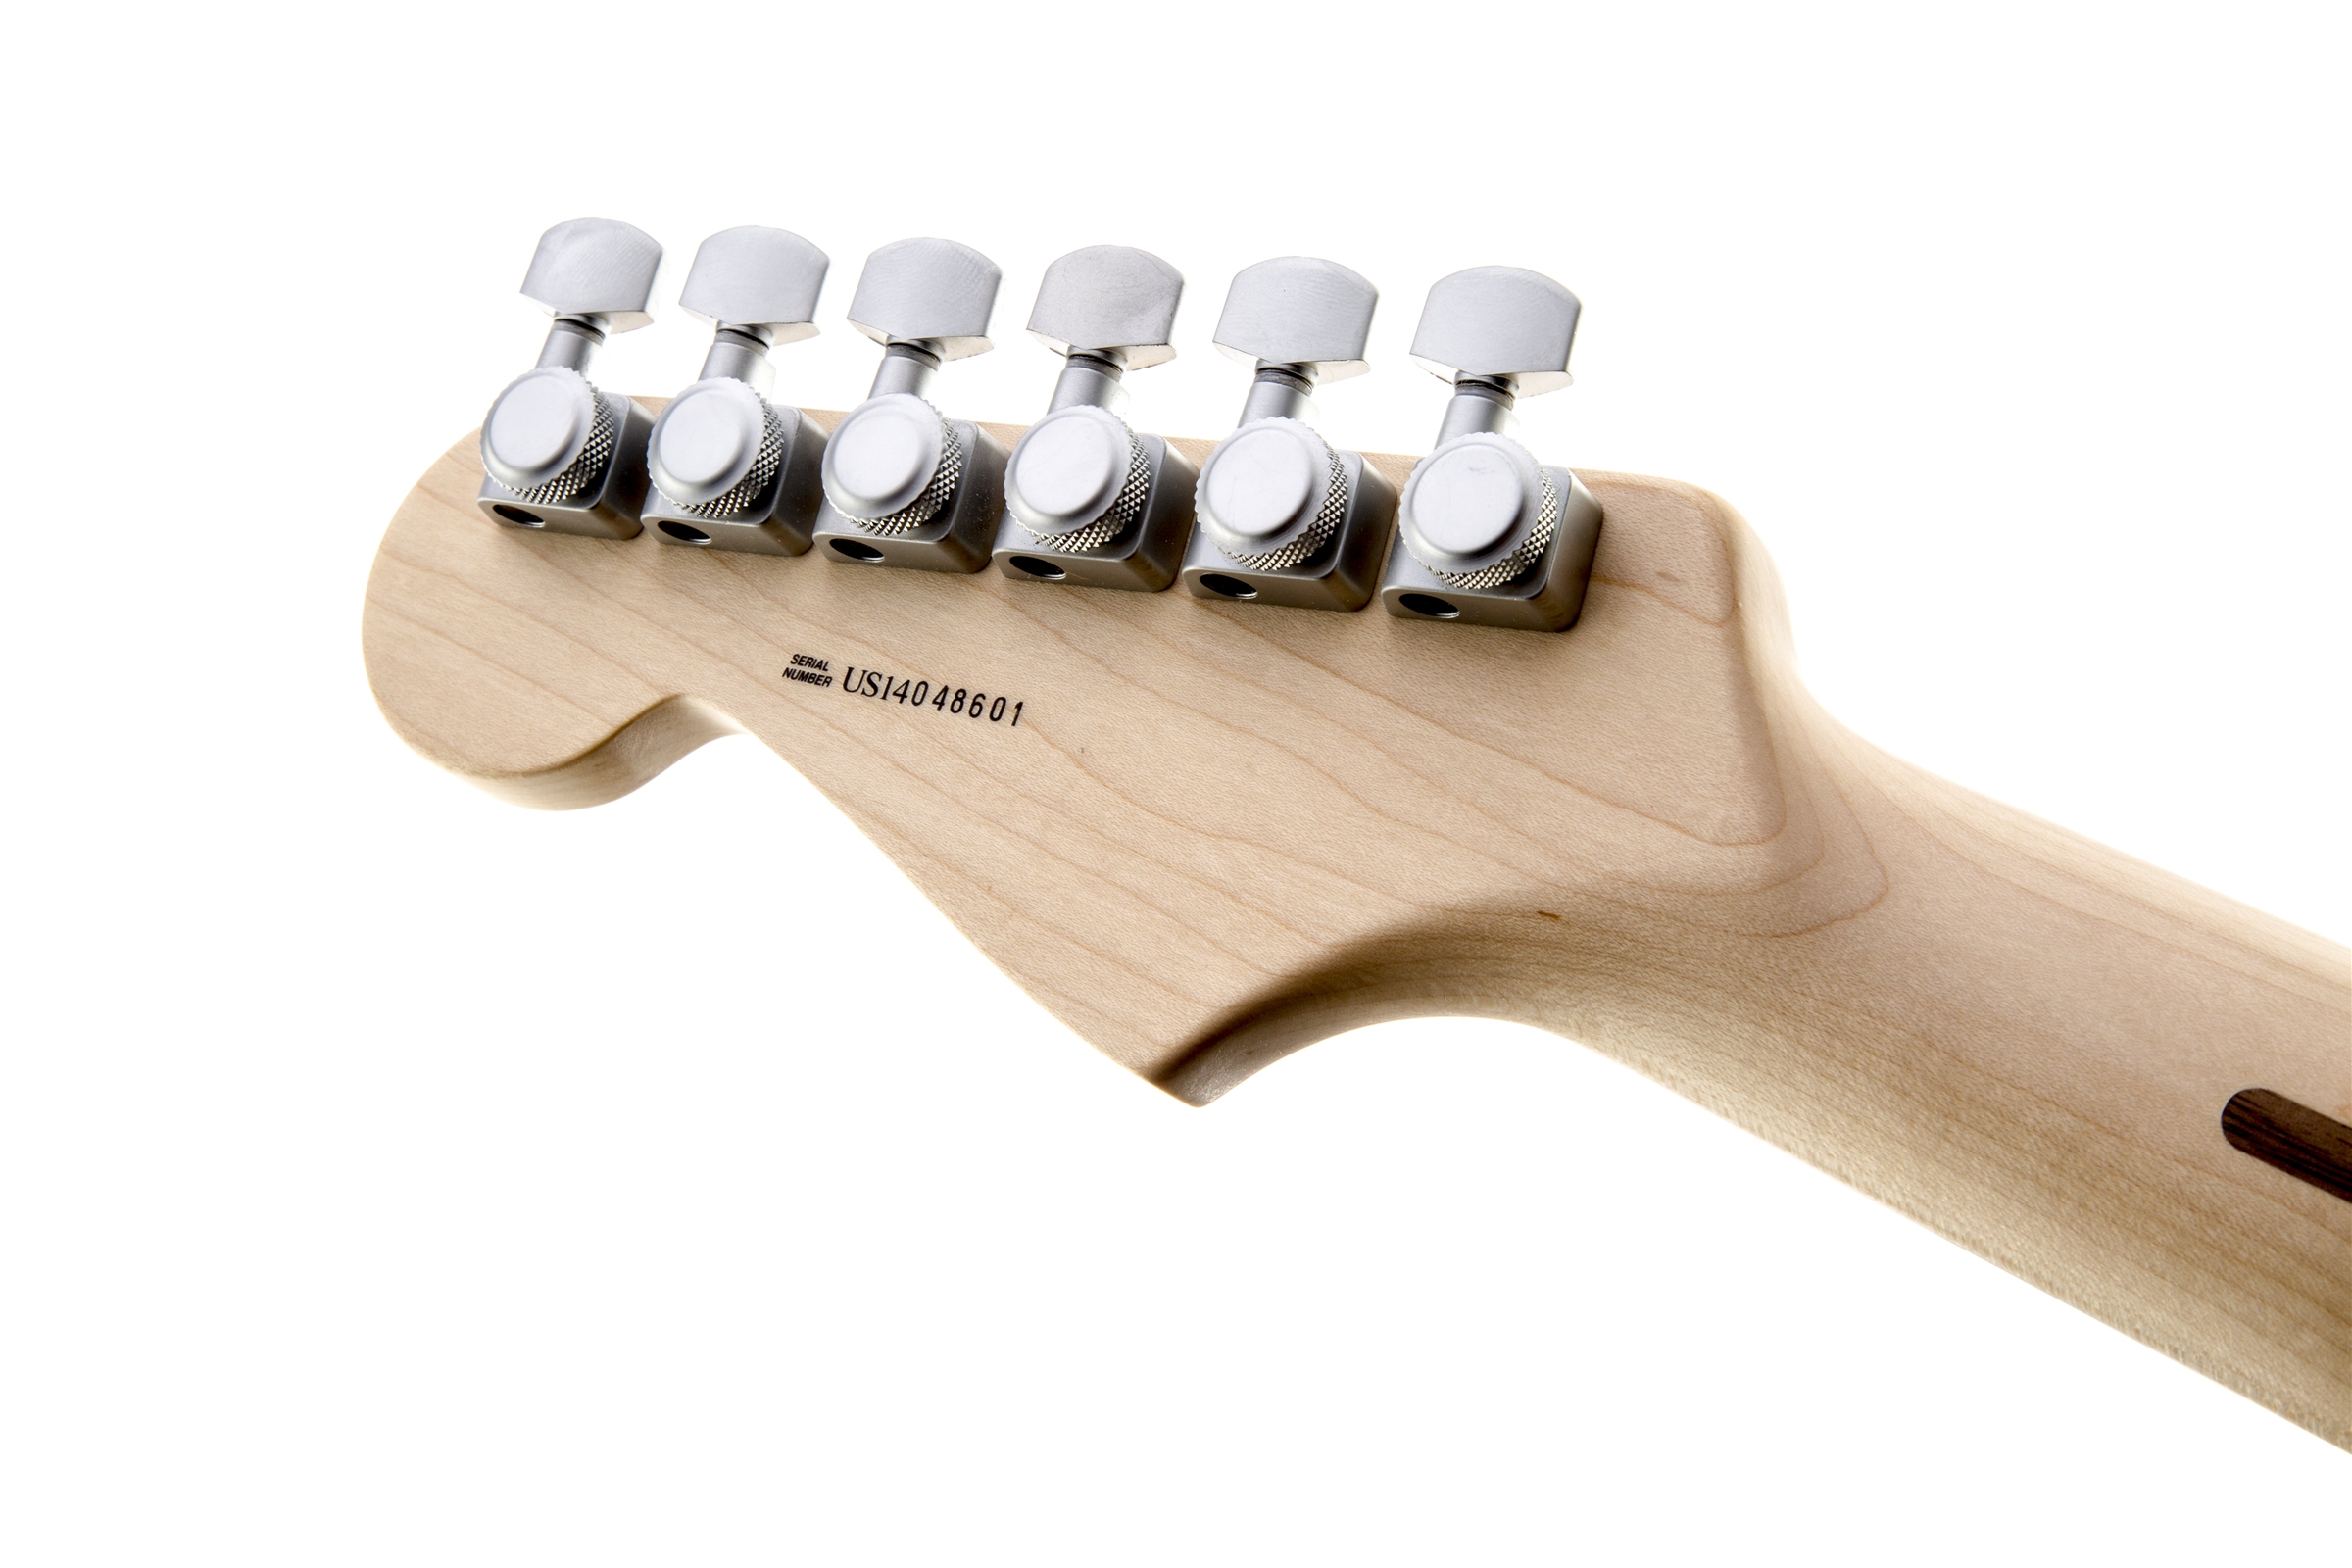 jeff beck stratocaster® rosewood fingerboard surf green fender jeff beck stratocaster® surf green